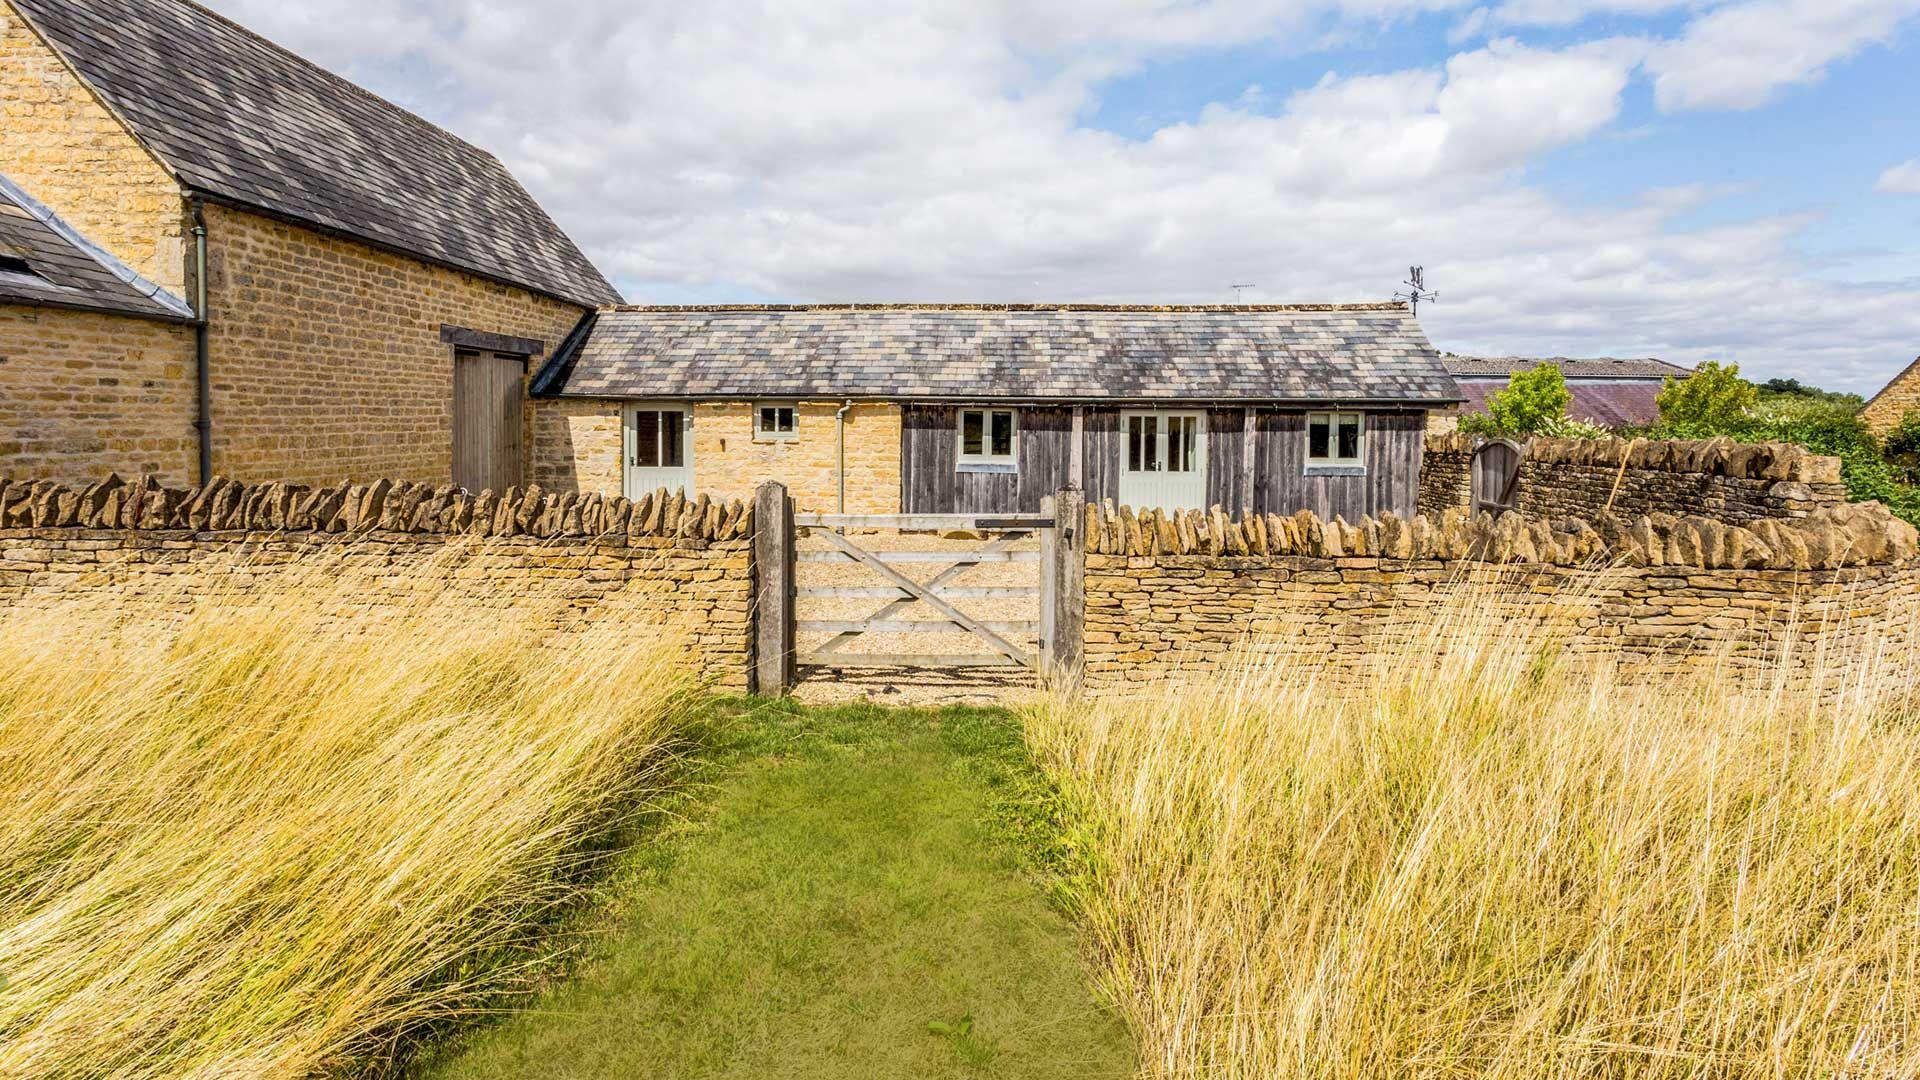 Marsh Farm Barn - StayCotswold